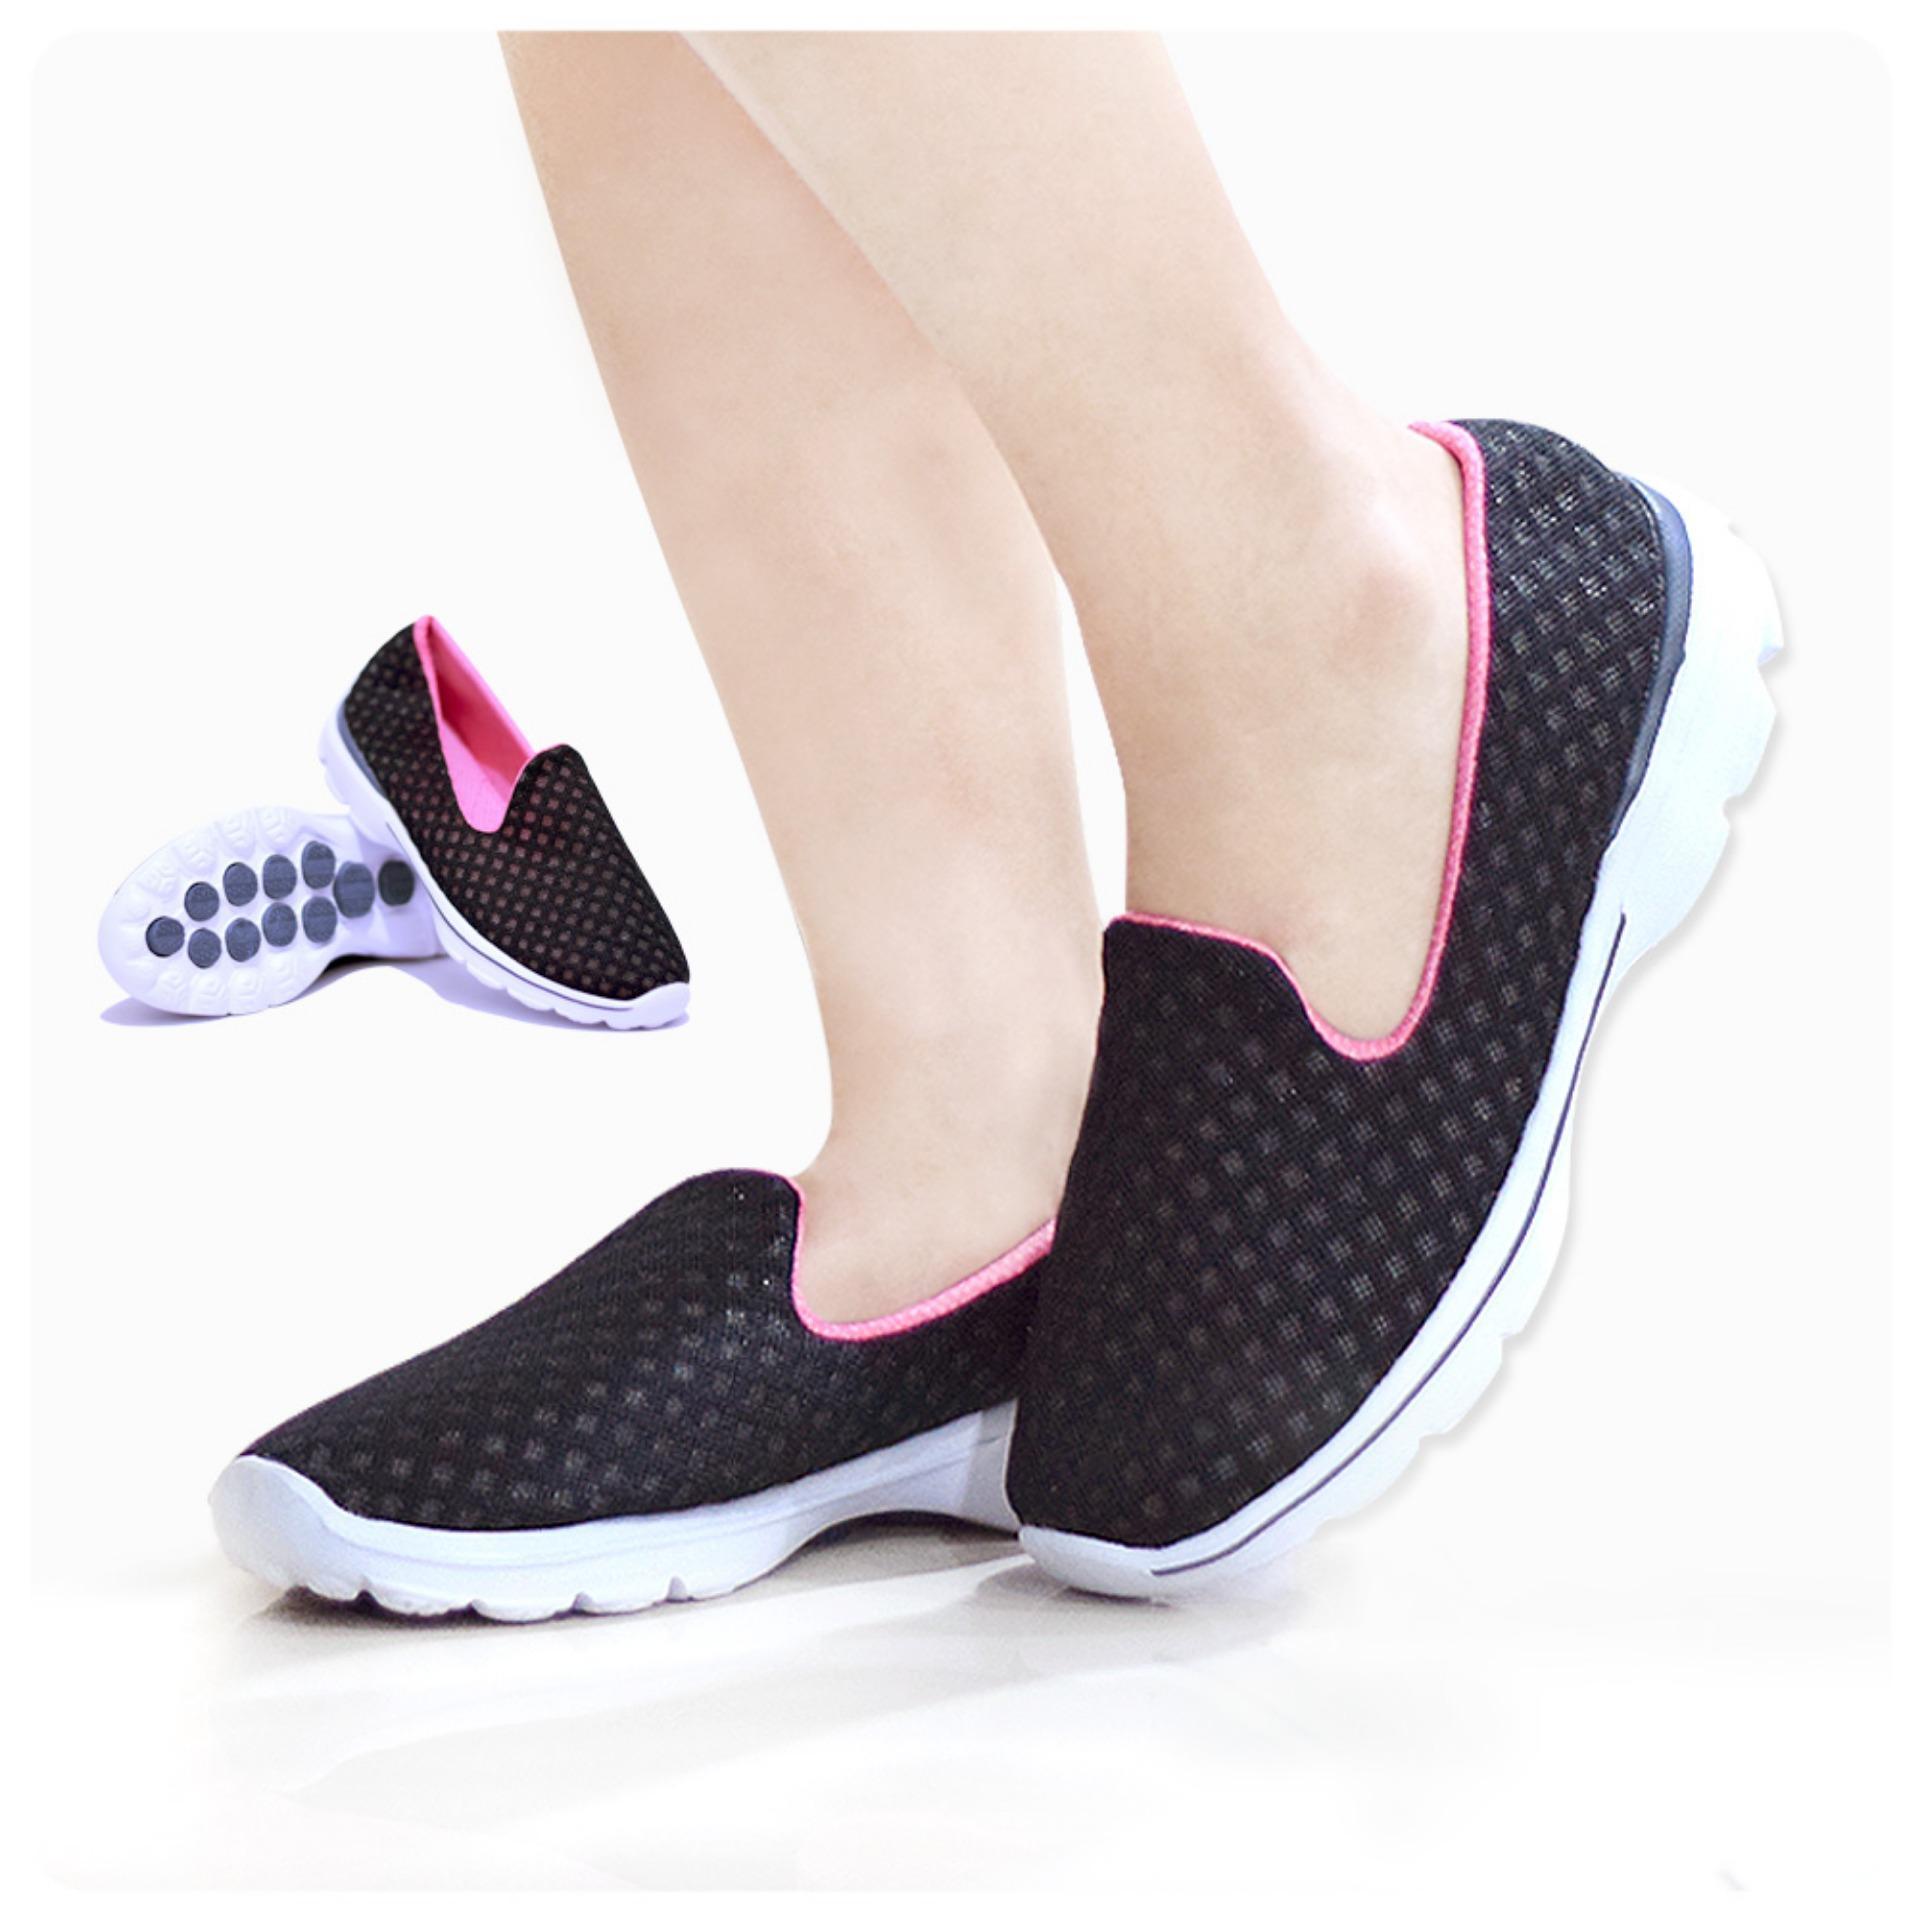 Jual Coolers Sepatu Wanita Pria Sneaker Sport Korean Style Black Pink Online